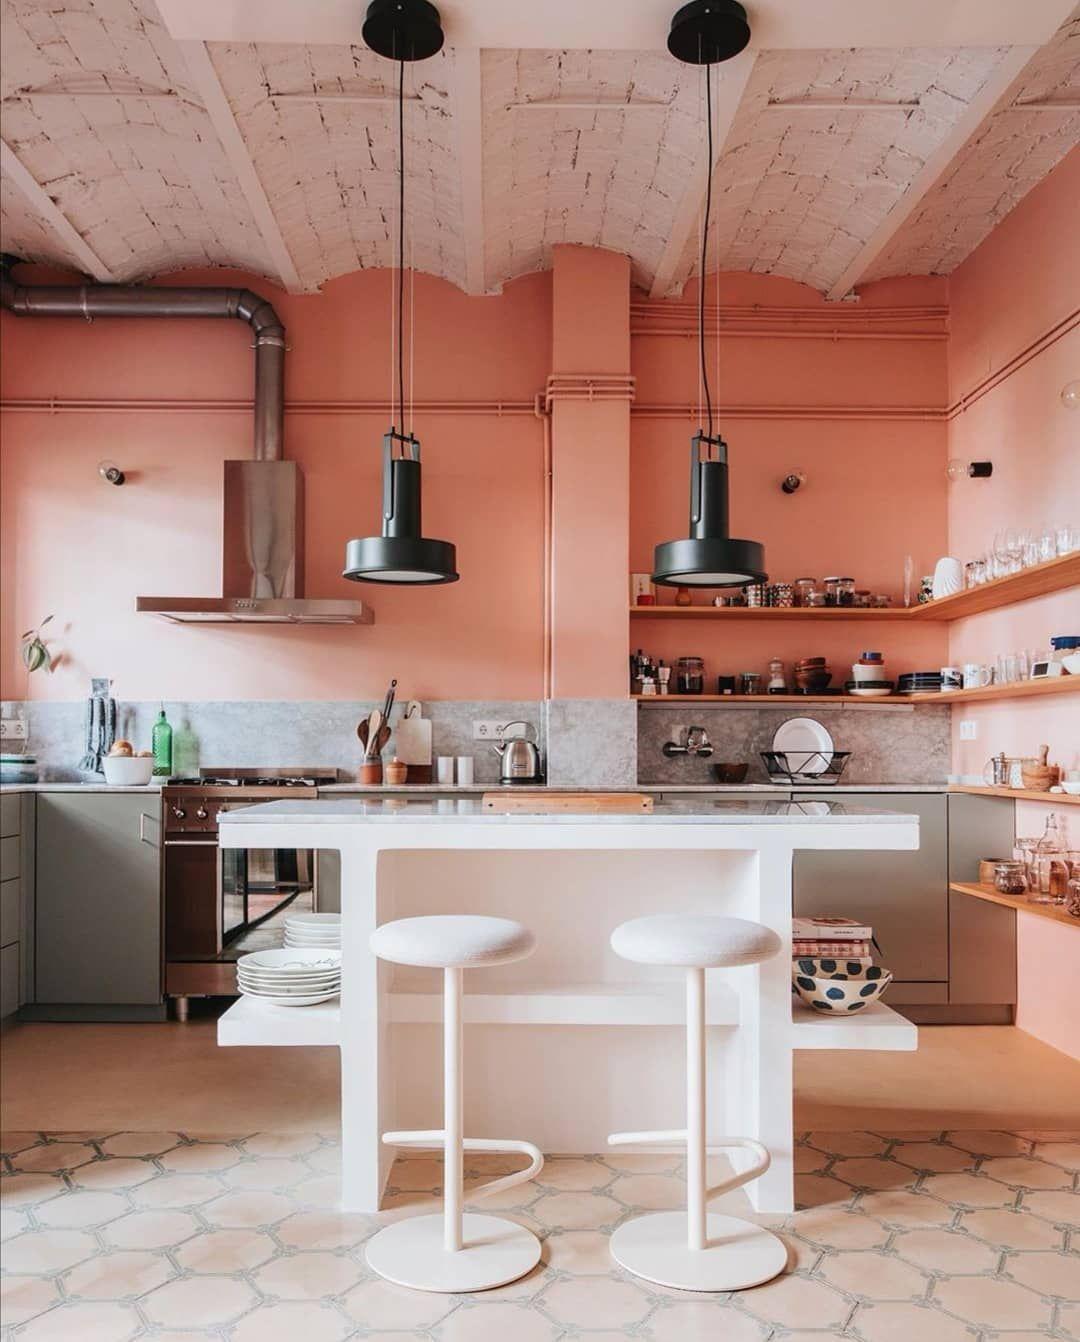 Elle Decoration On Instagram Peach Perfect We Blijven Het Zeggen Breng Kleur In Je Interieu Kitchen Design Color Kitchen Tiles Design Kitchen Pantry Design